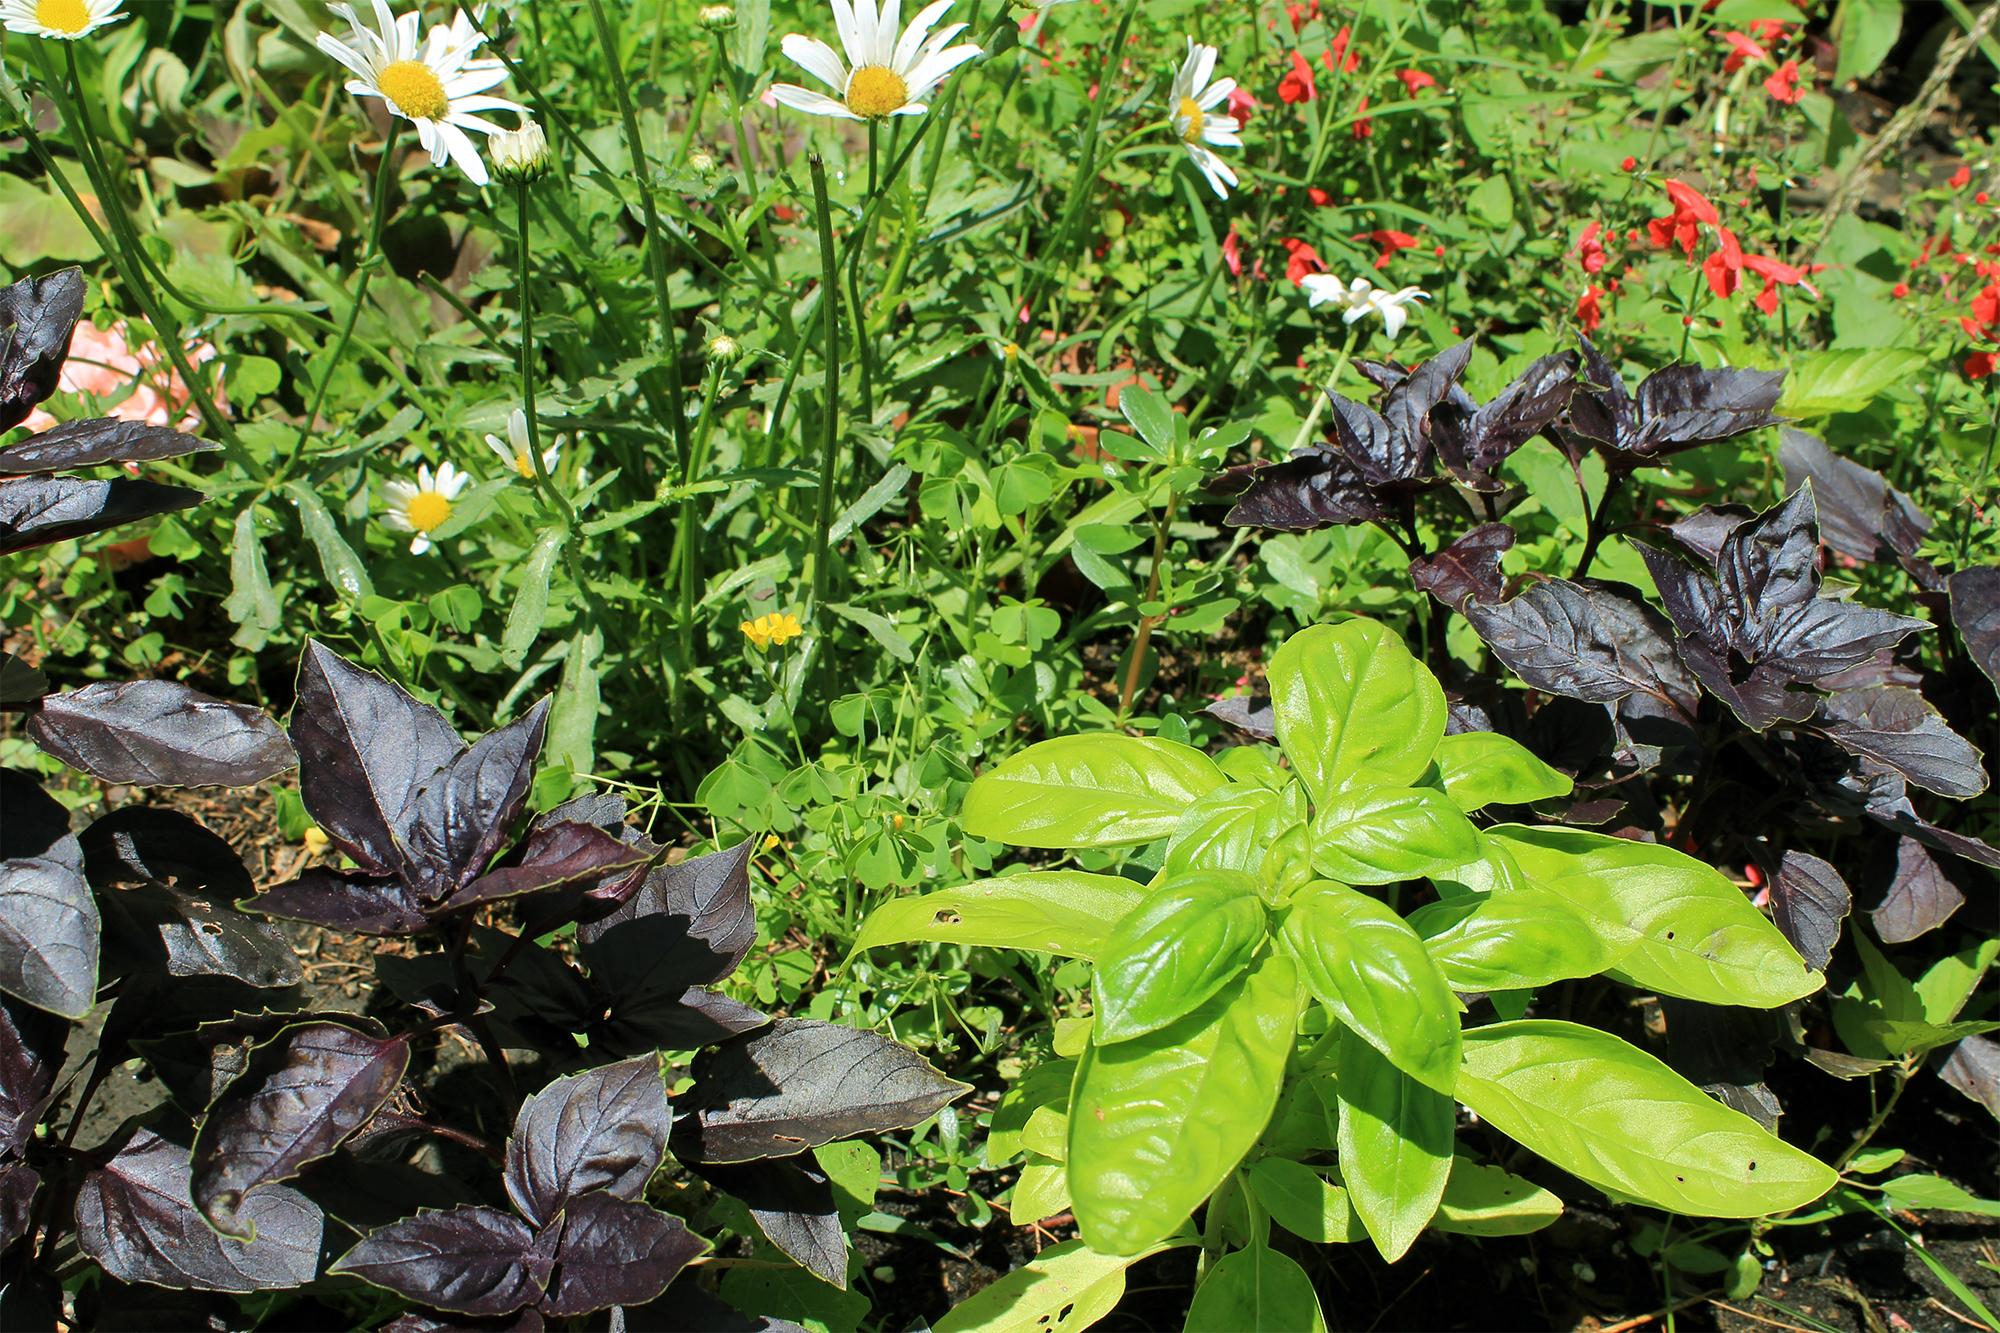 Edible Florida Gardening, Authentic Florida